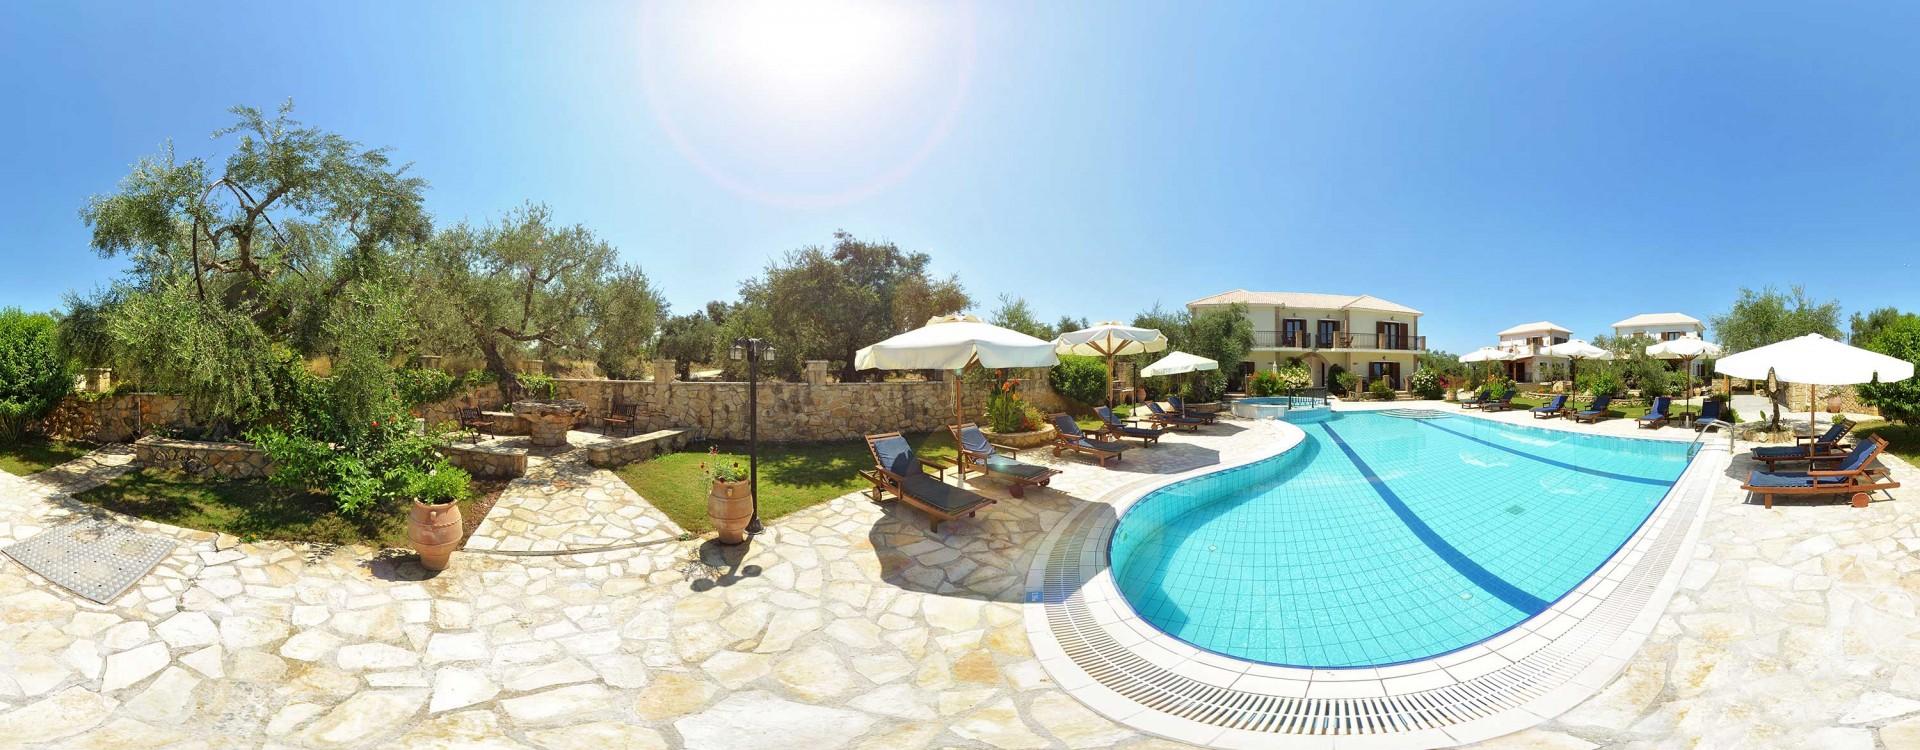 our villas in kypseli